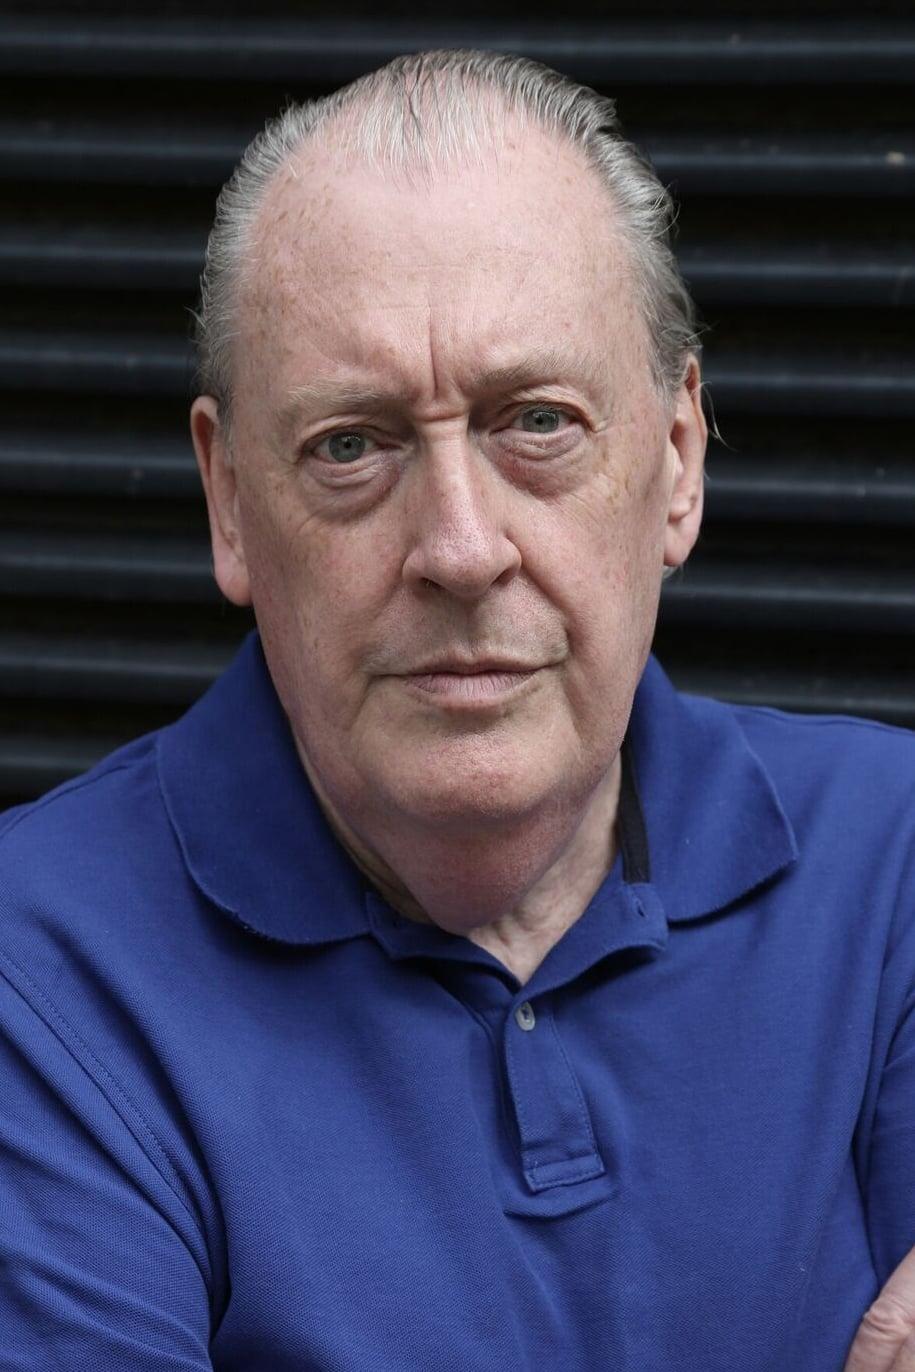 Michael Culkin